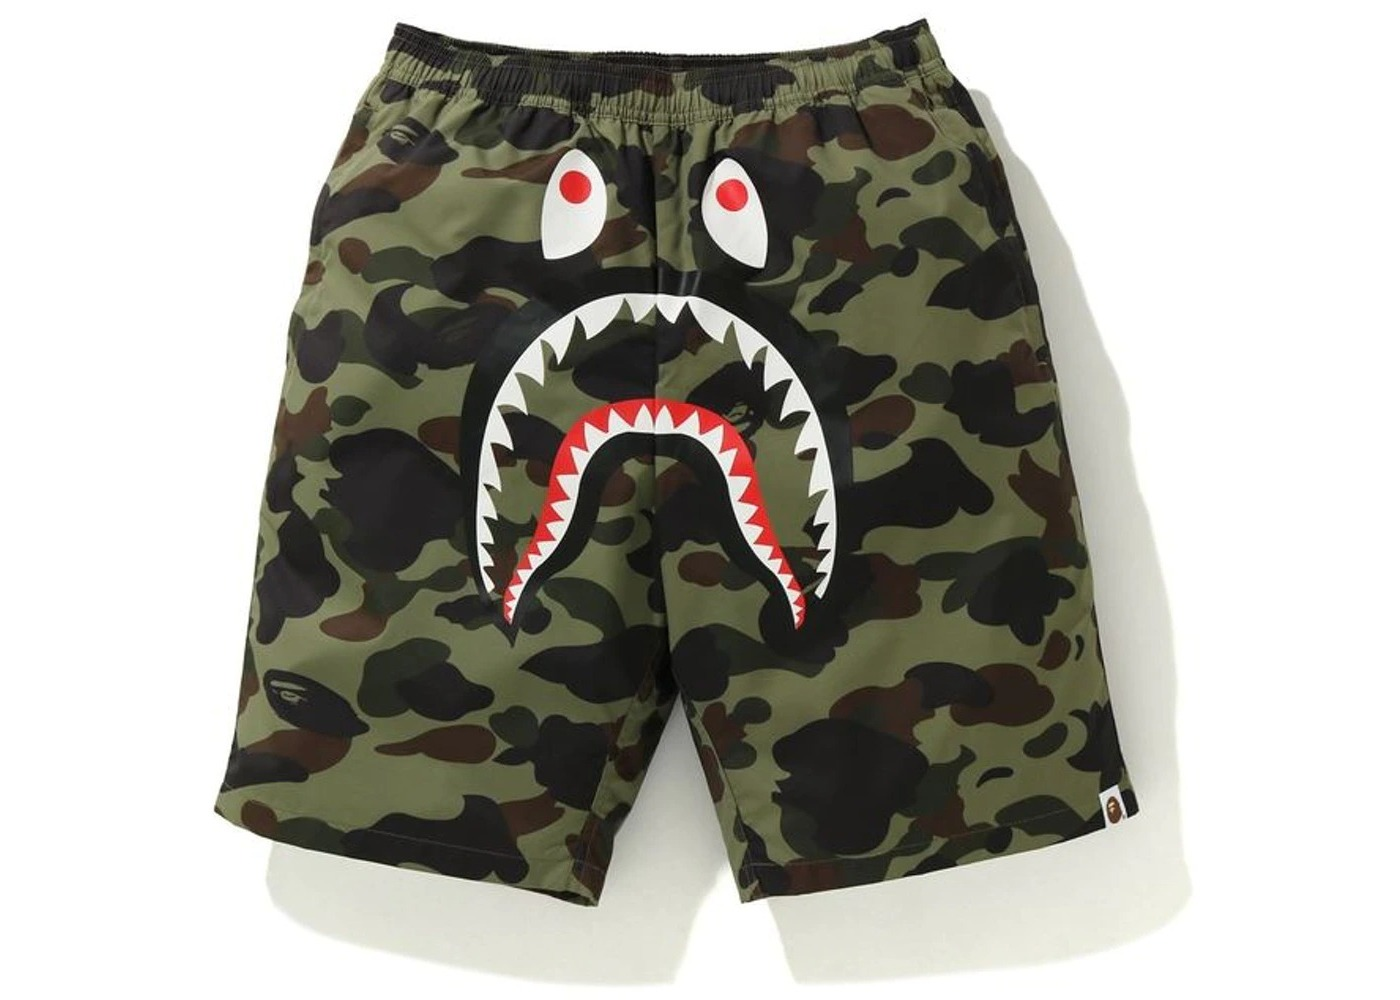 Bape 1st Camo Shark Beach Pants Green (FW20)の写真